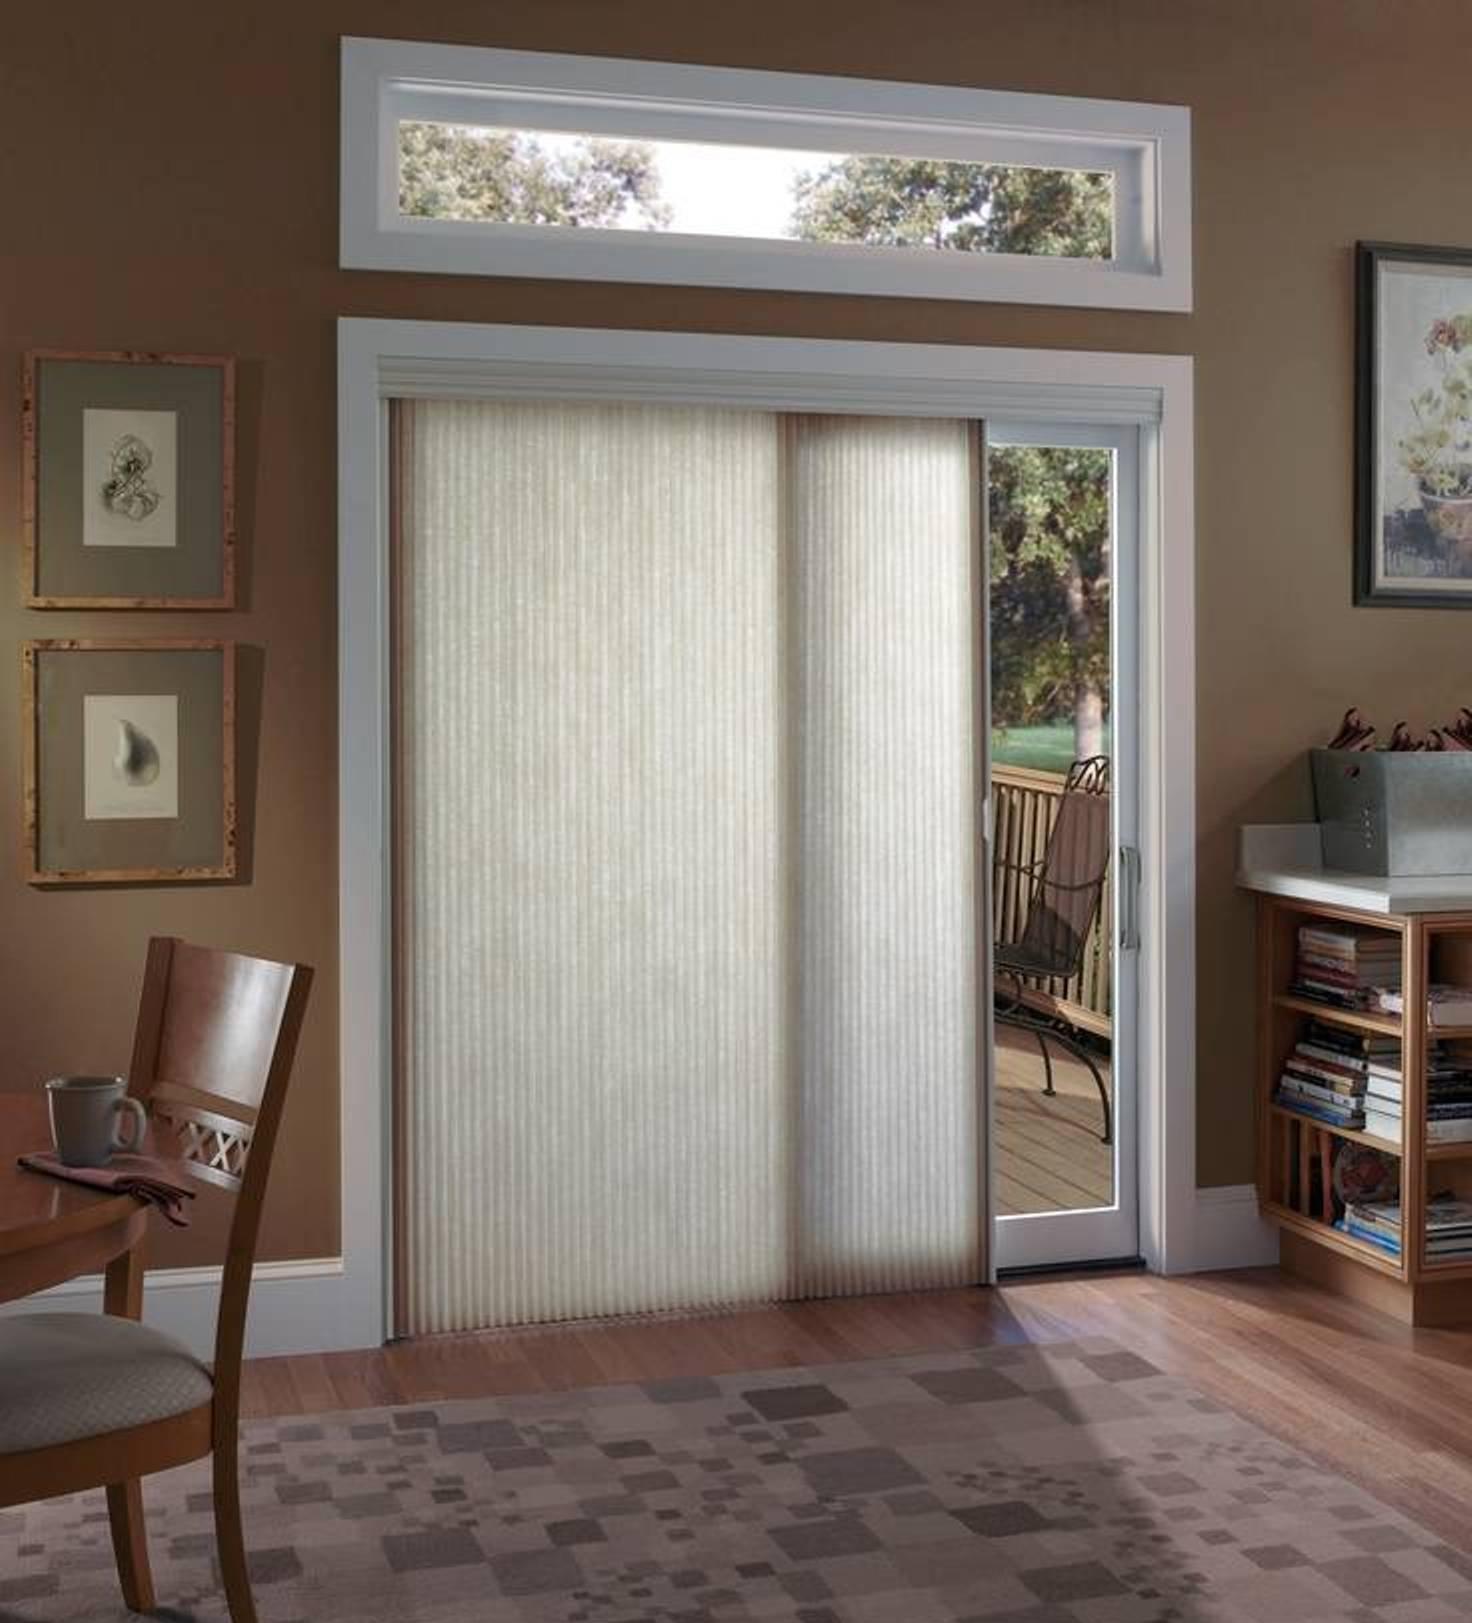 Sliding Glass Door Cover IdeasSliding Glass Door Cover Ideas